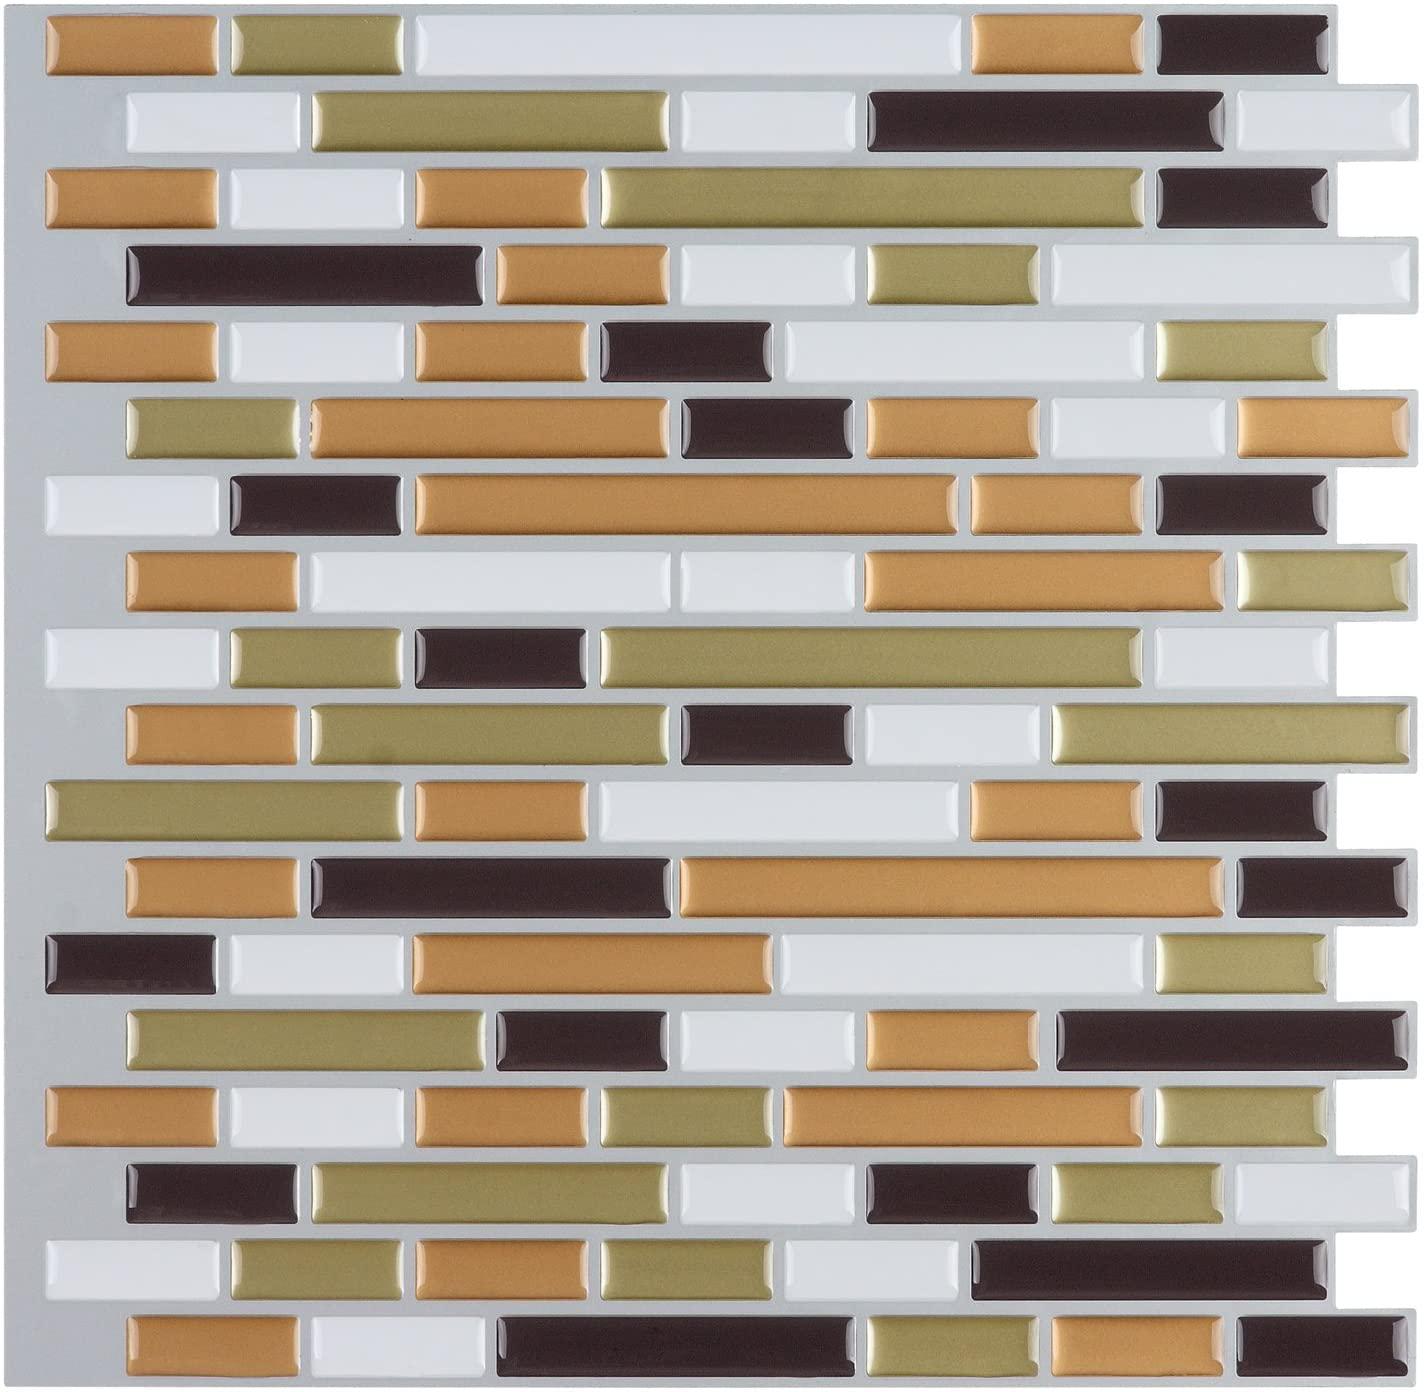 Art3d 10-Piece Peel-N-Stick Backsplash Tile Sticker Vinyl Wall Covering, 12